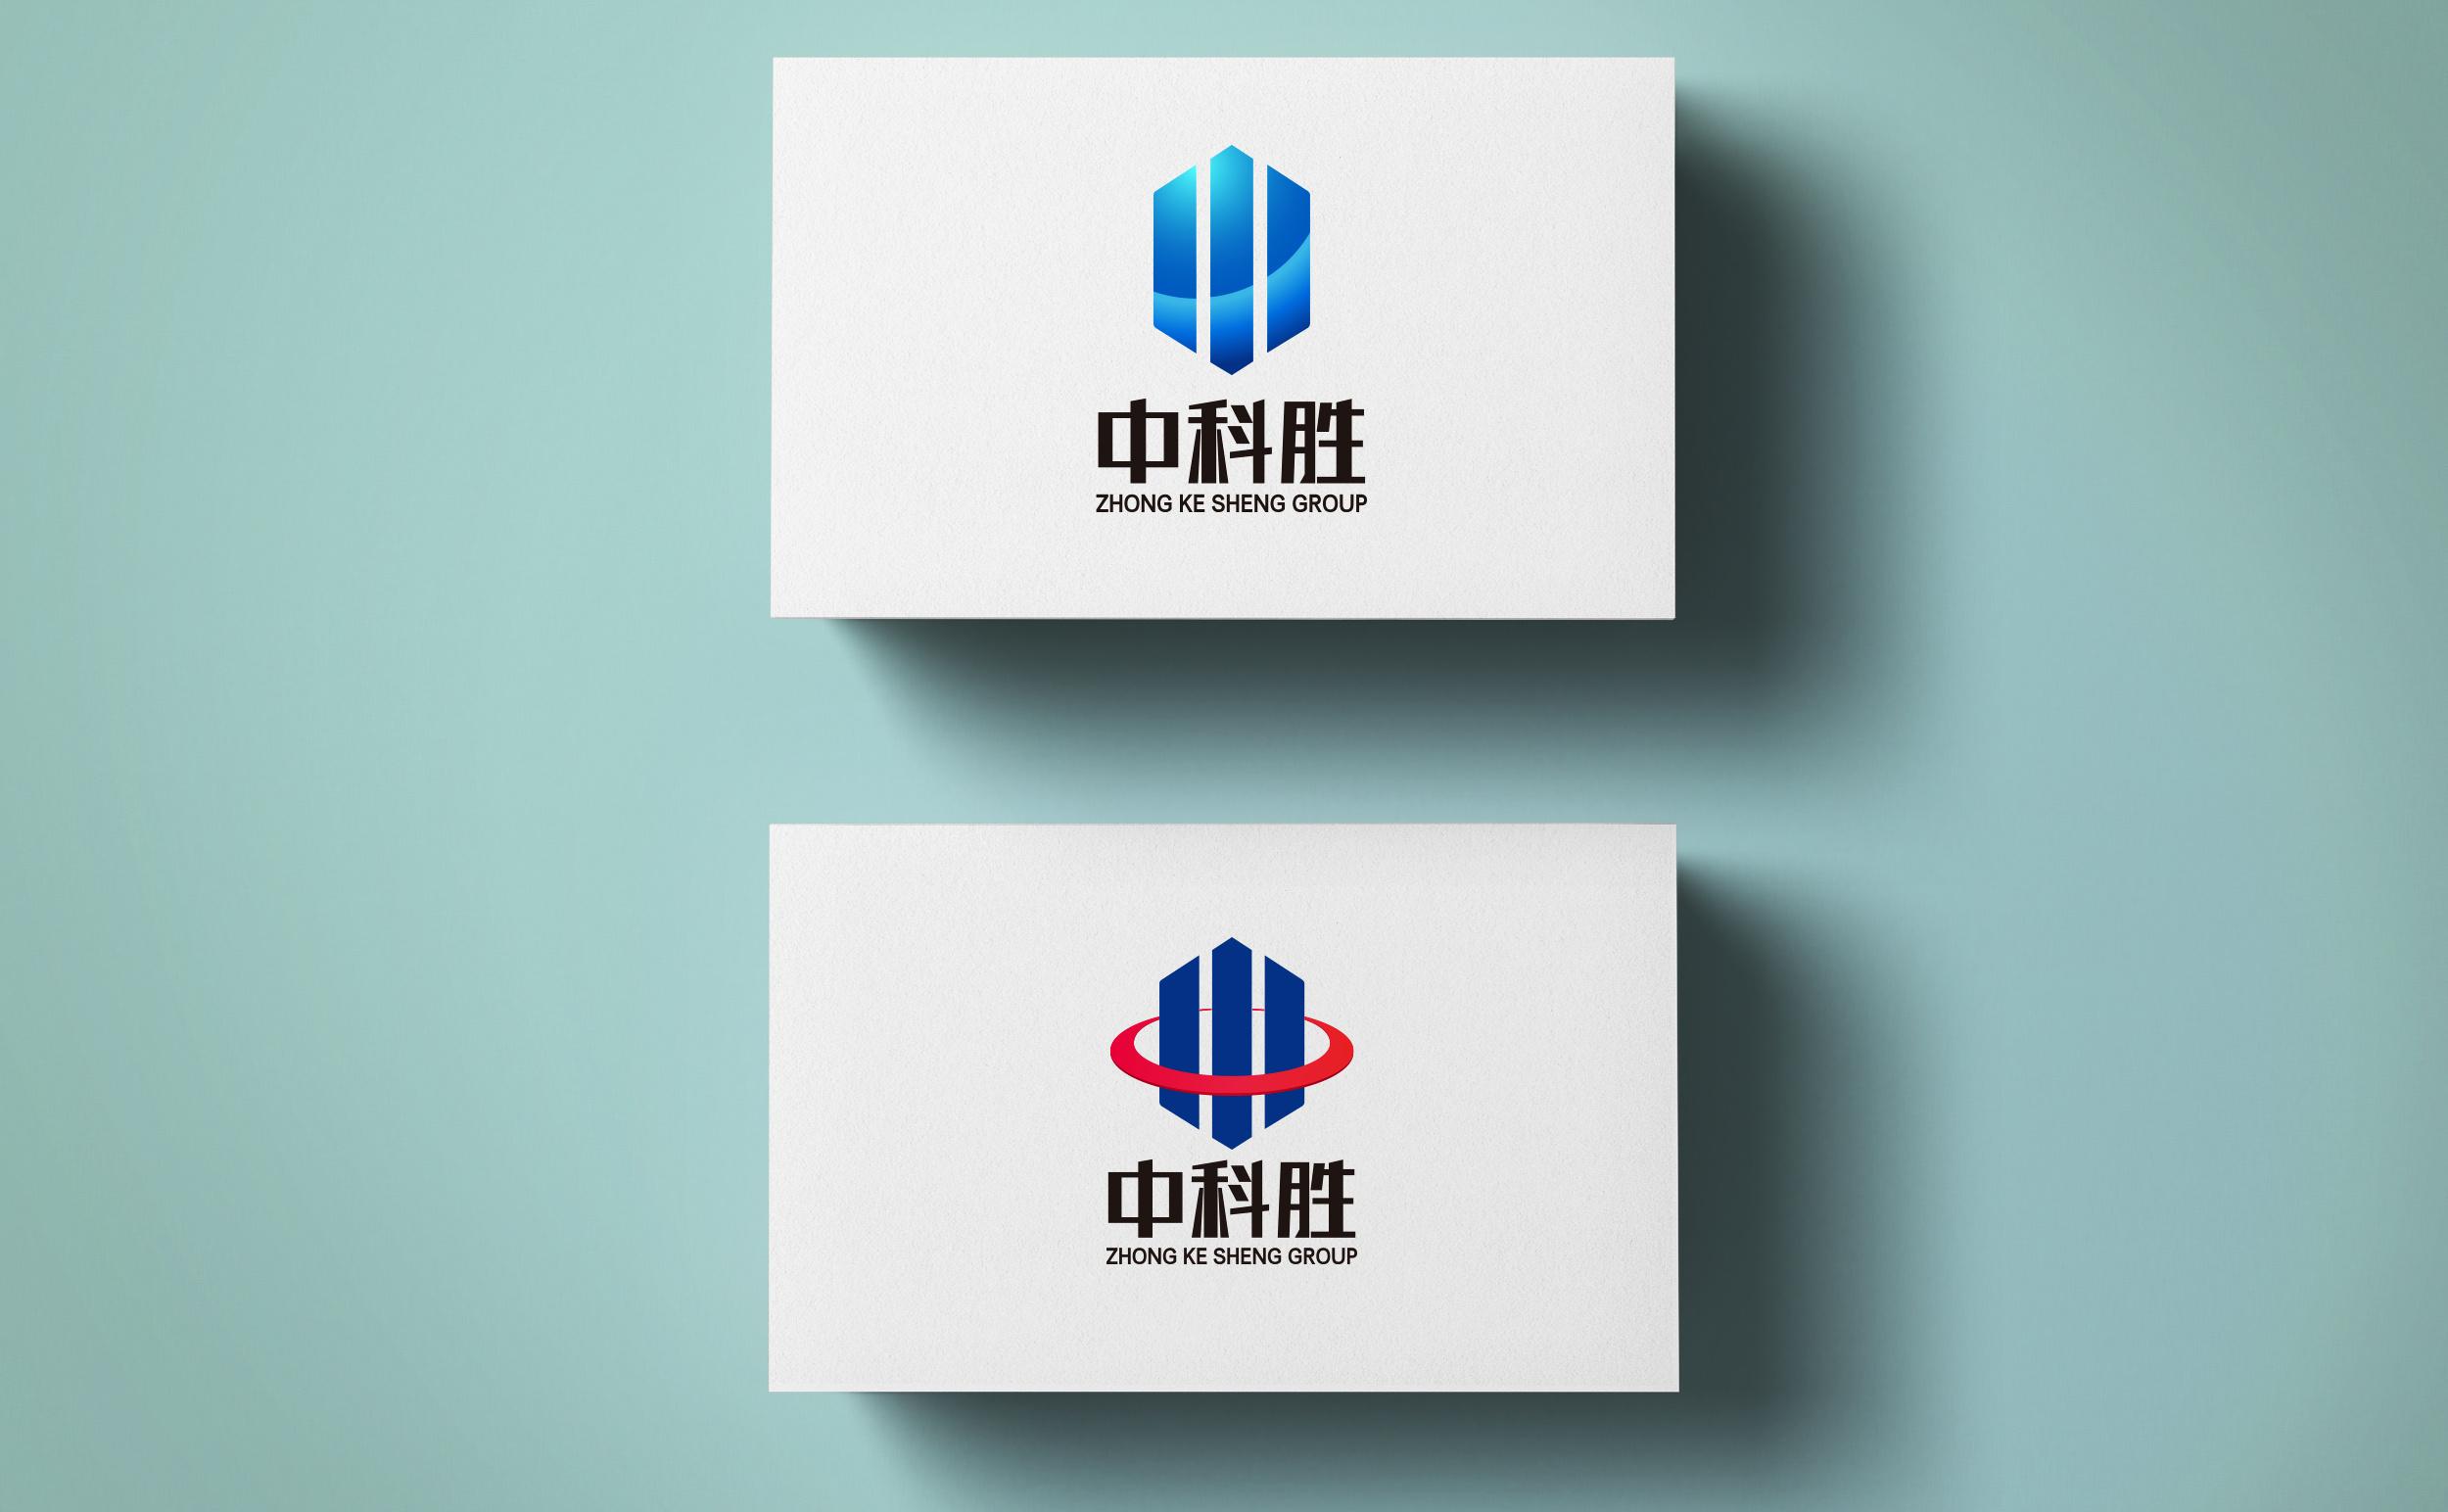 企业logm�'h�_企业logo